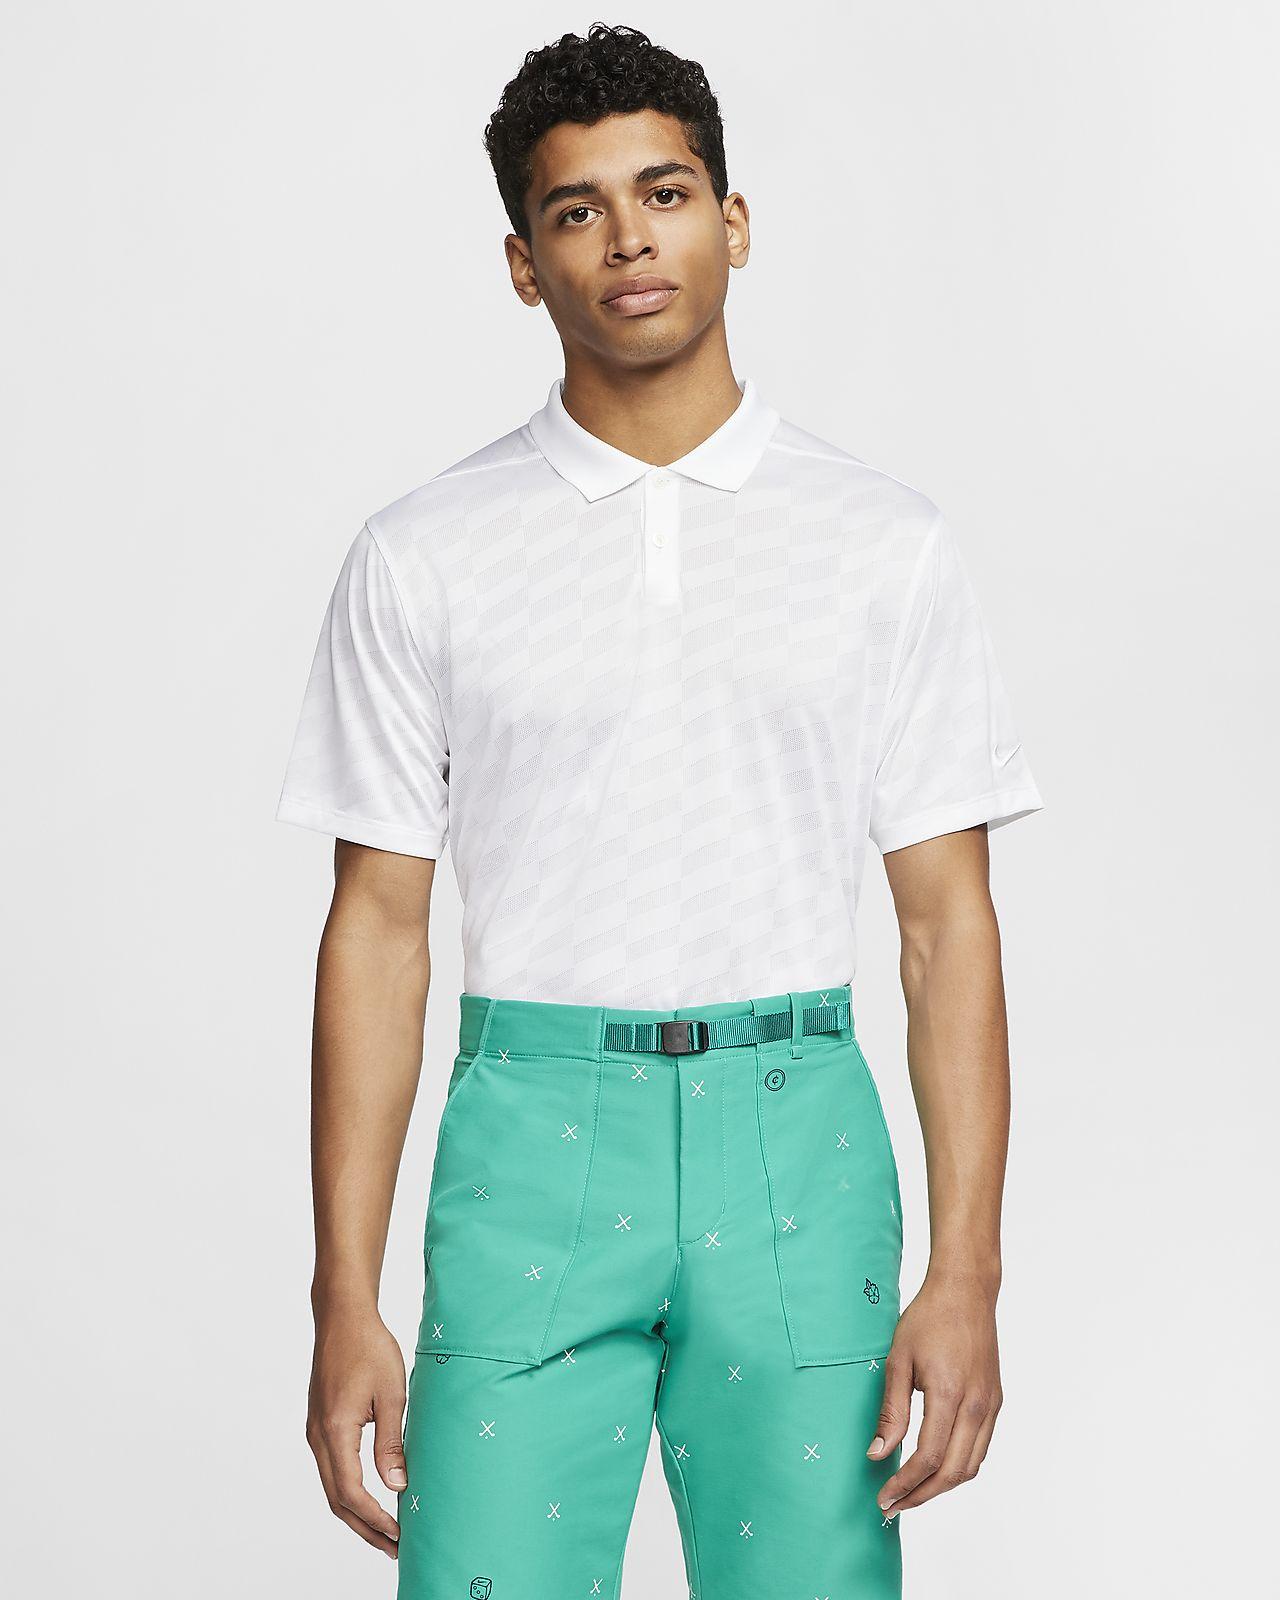 Nike Dri-FIT Vapor Golf-Poloshirt für Herren